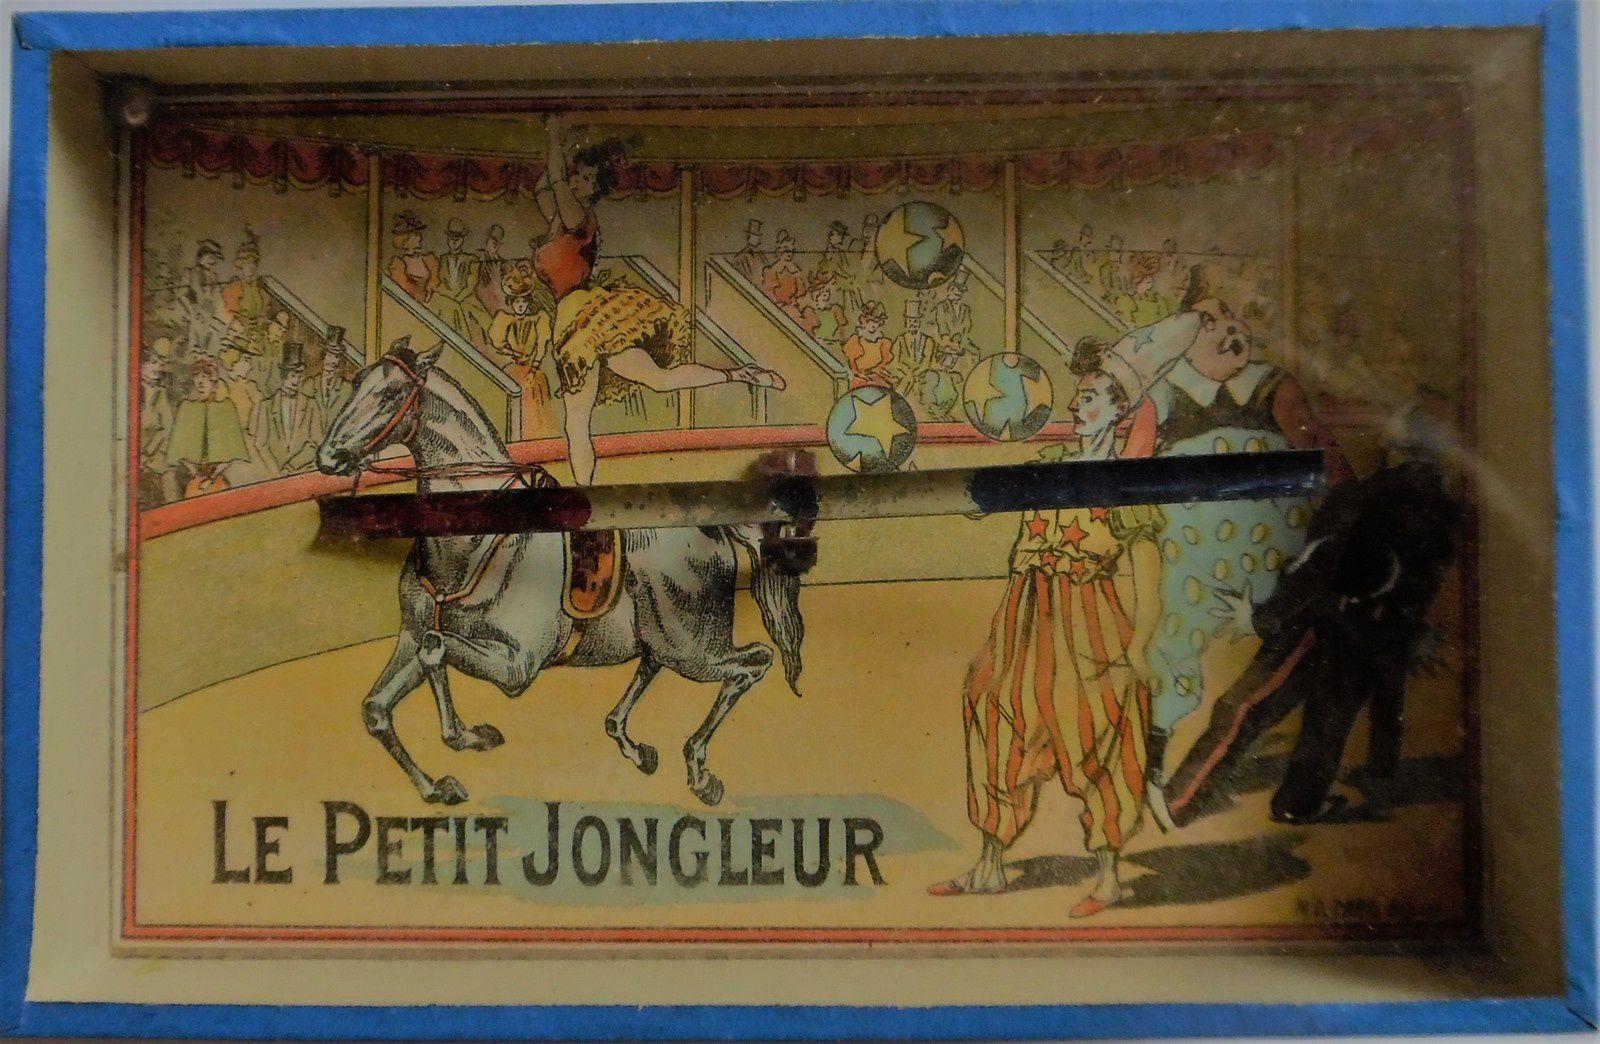 le petit jongleur, il faut amener la bille sur la rampe basculante...